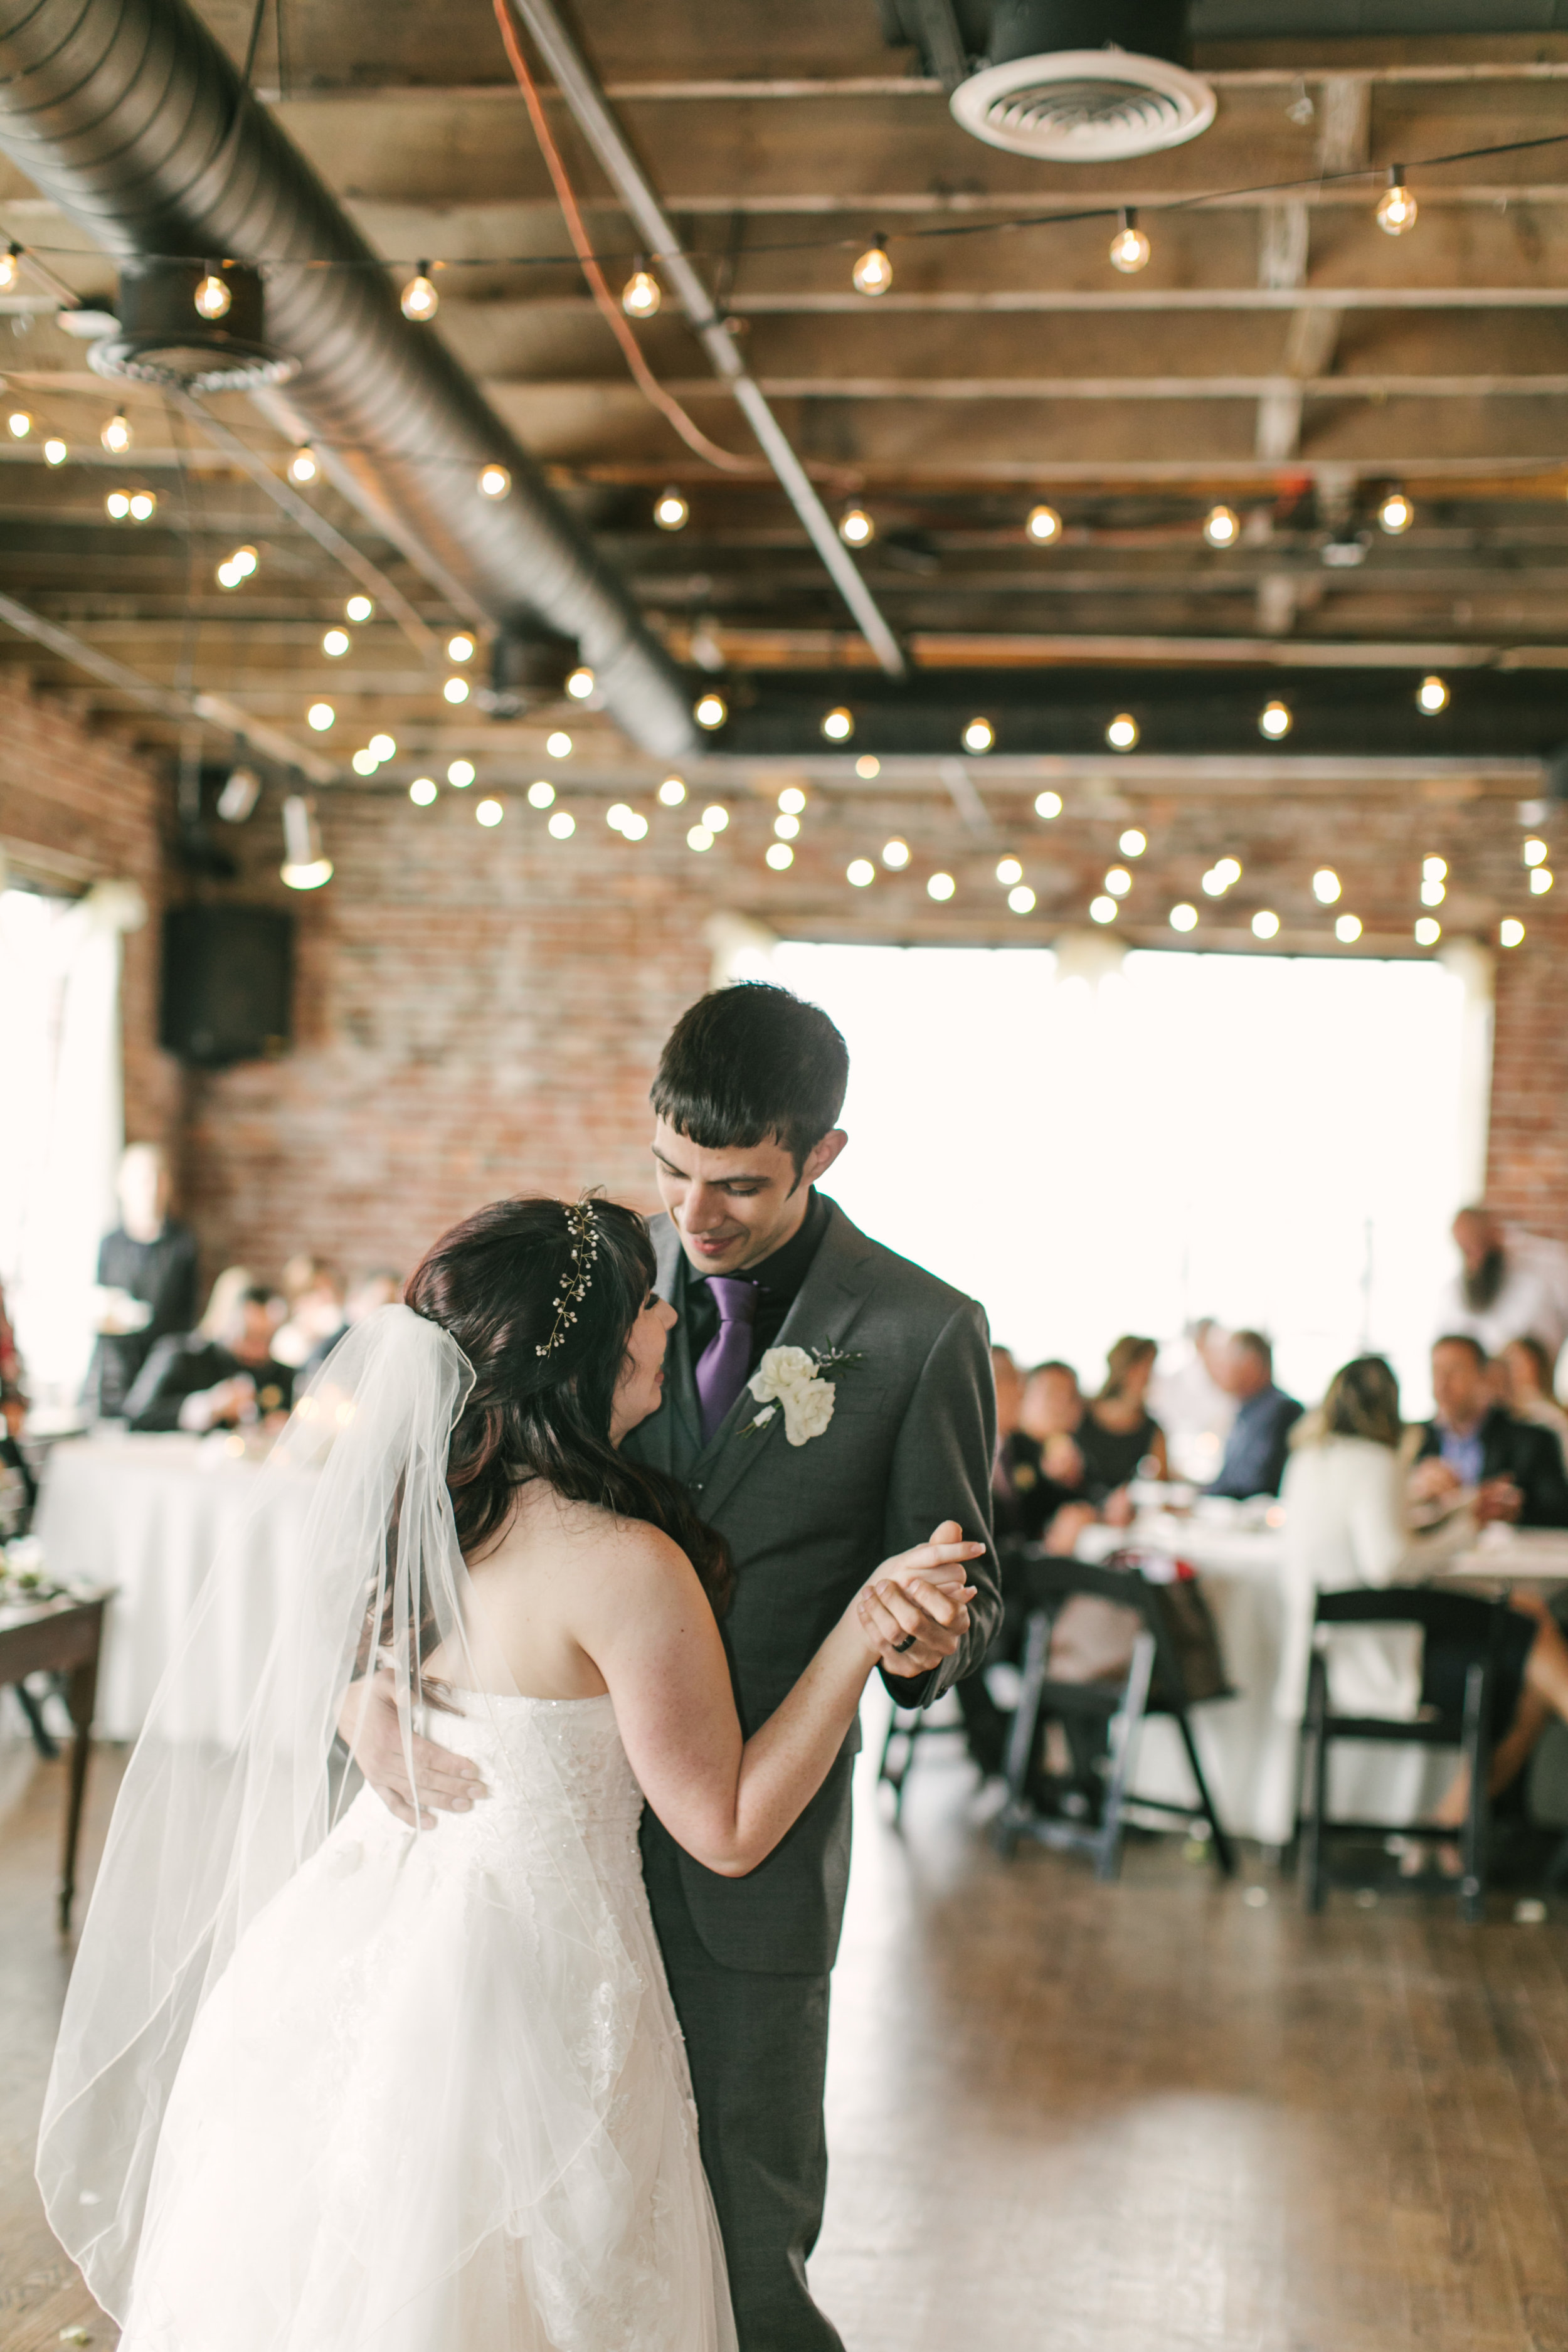 653_Colin+Jessica_Wedding.jpg